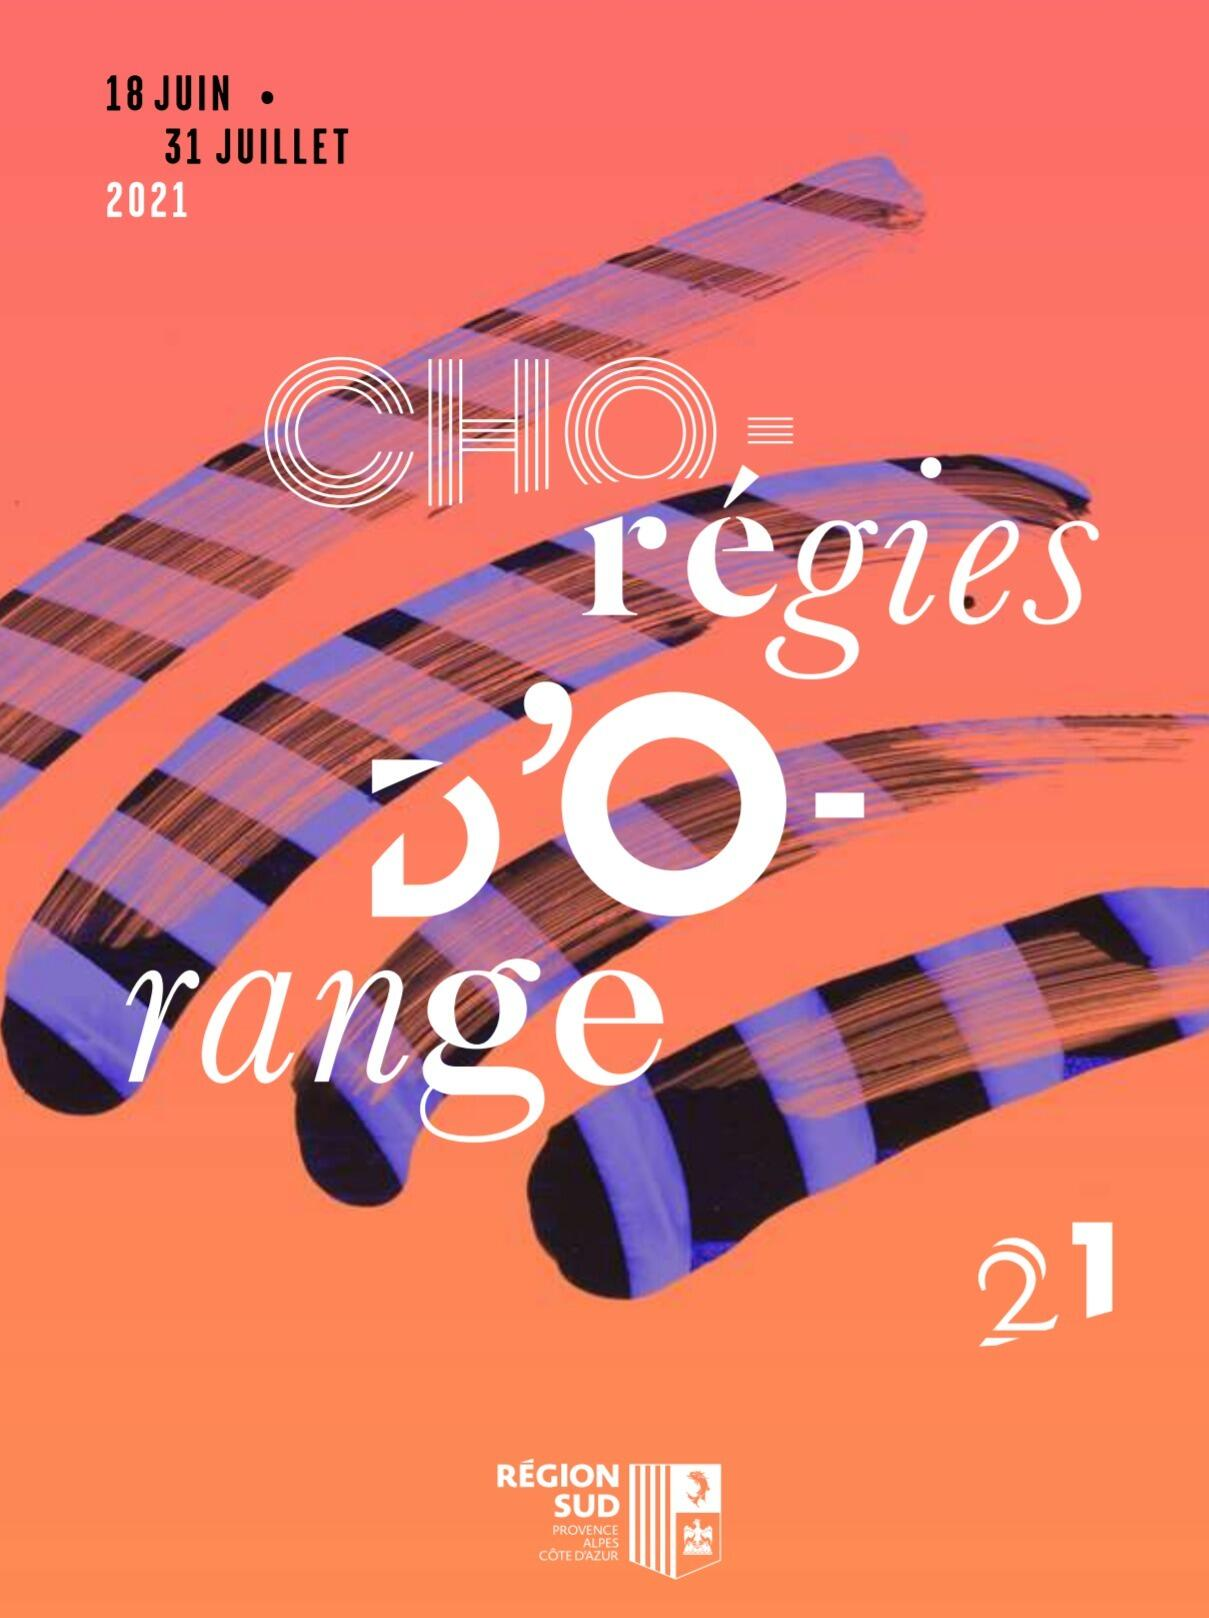 choregieorange2021_1610459803